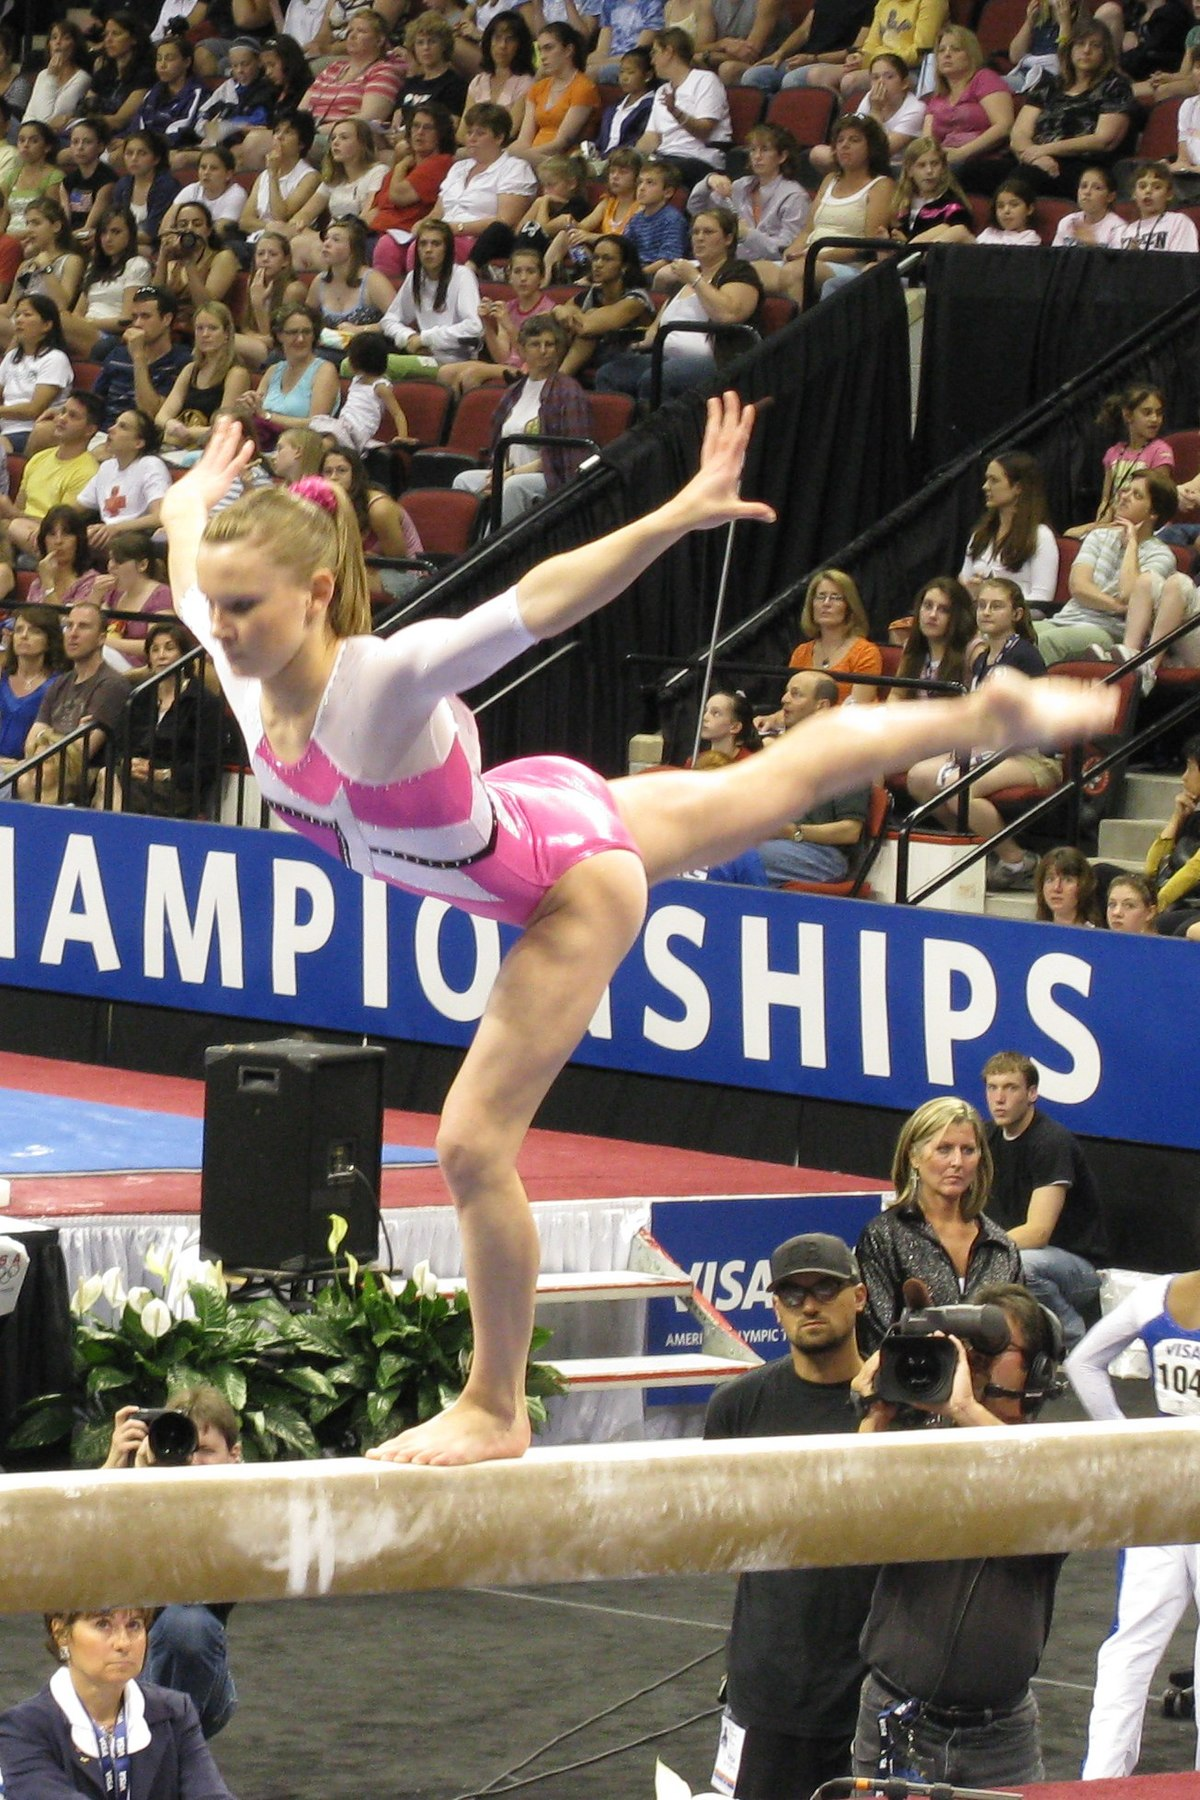 Image forward roll jpg gymnastics wiki - Image Forward Roll Jpg Gymnastics Wiki 12